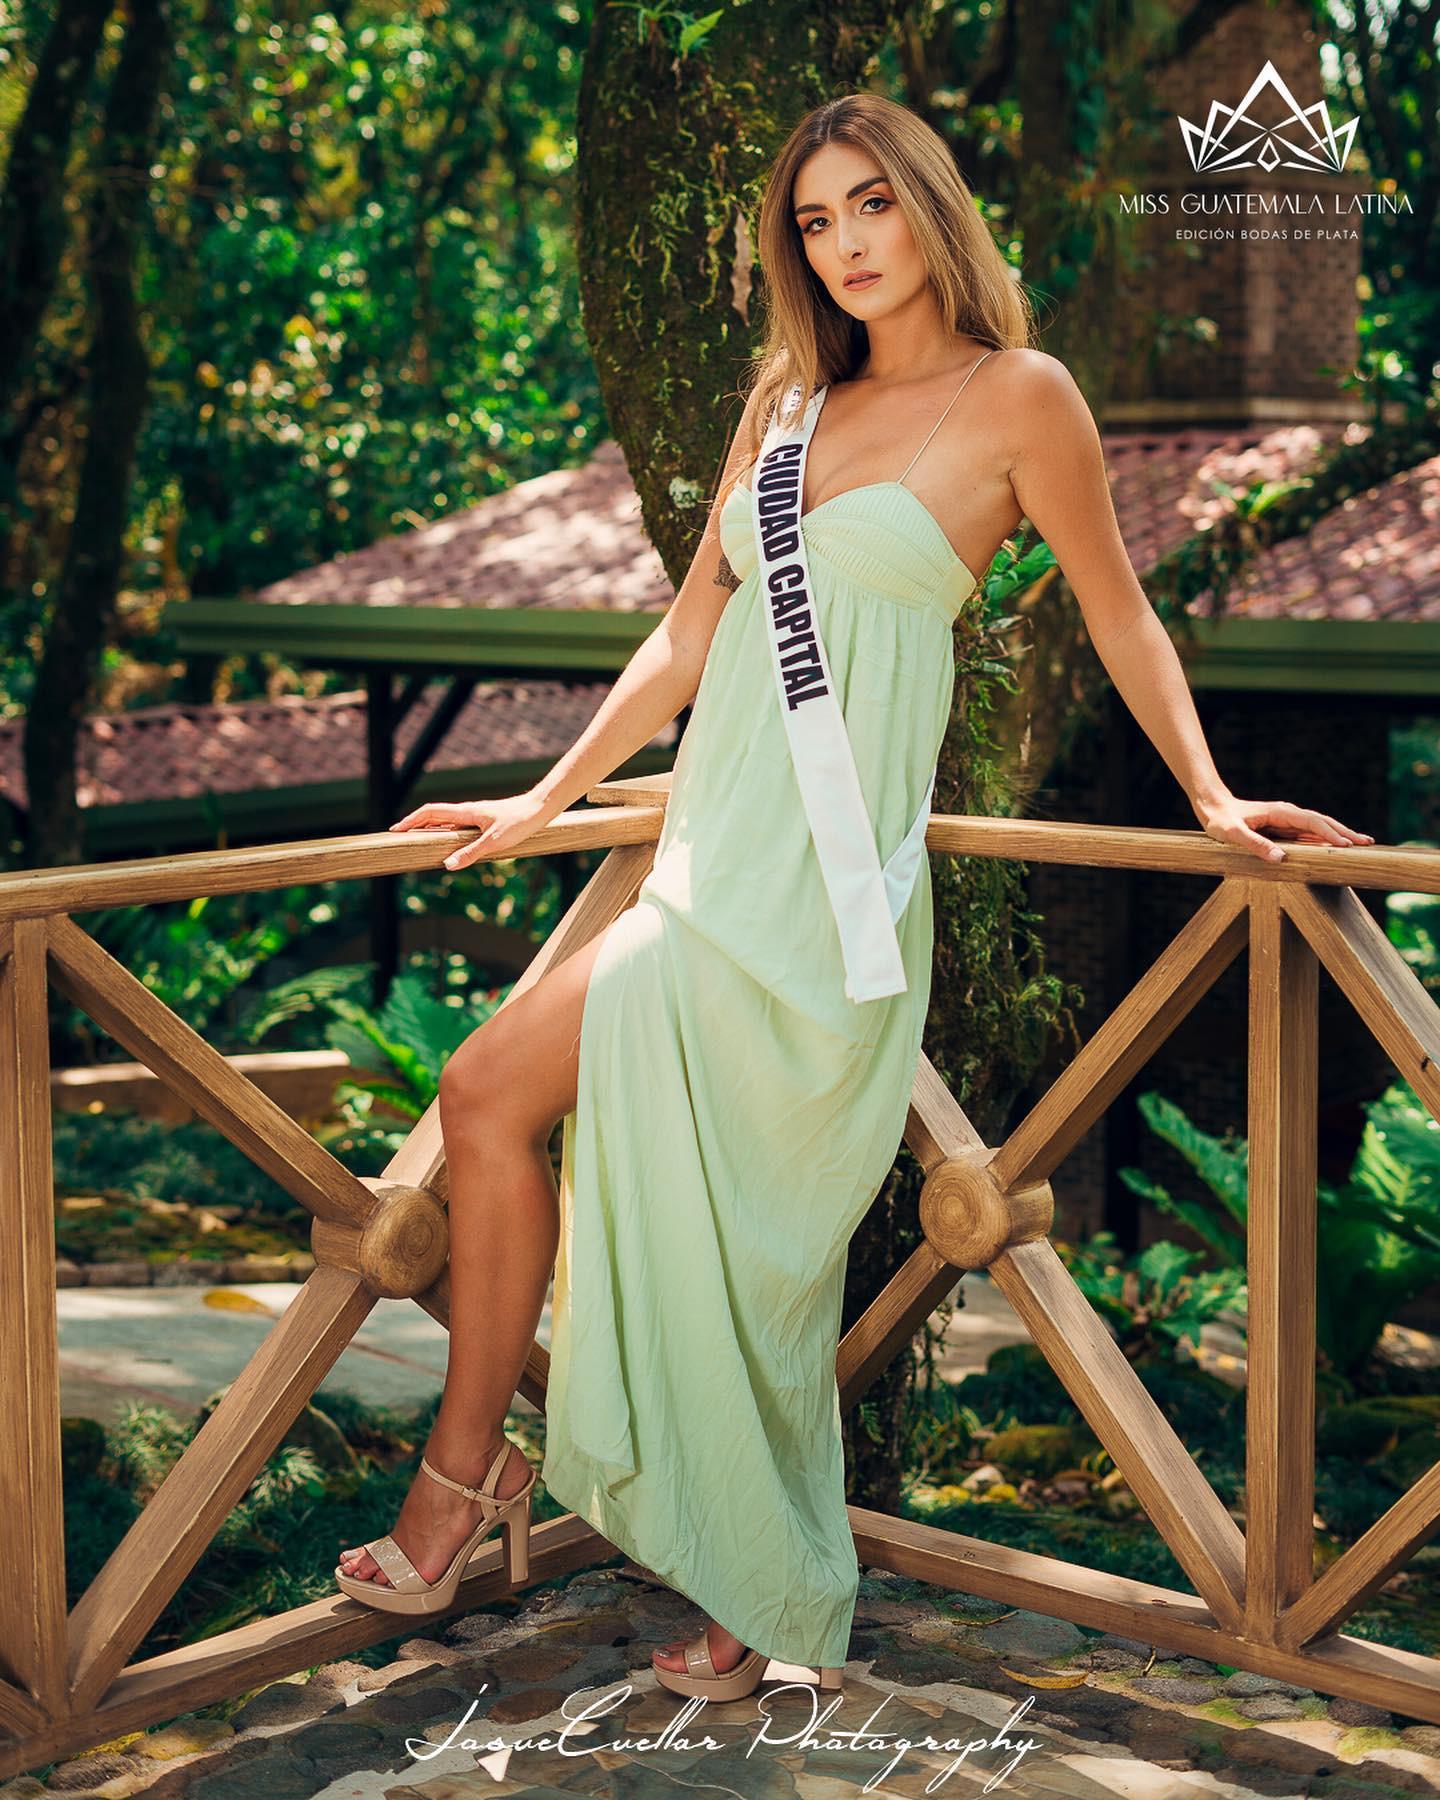 candidatas a miss guatemala latina 2021. final: 30 de abril. - Página 7 BFjNSt